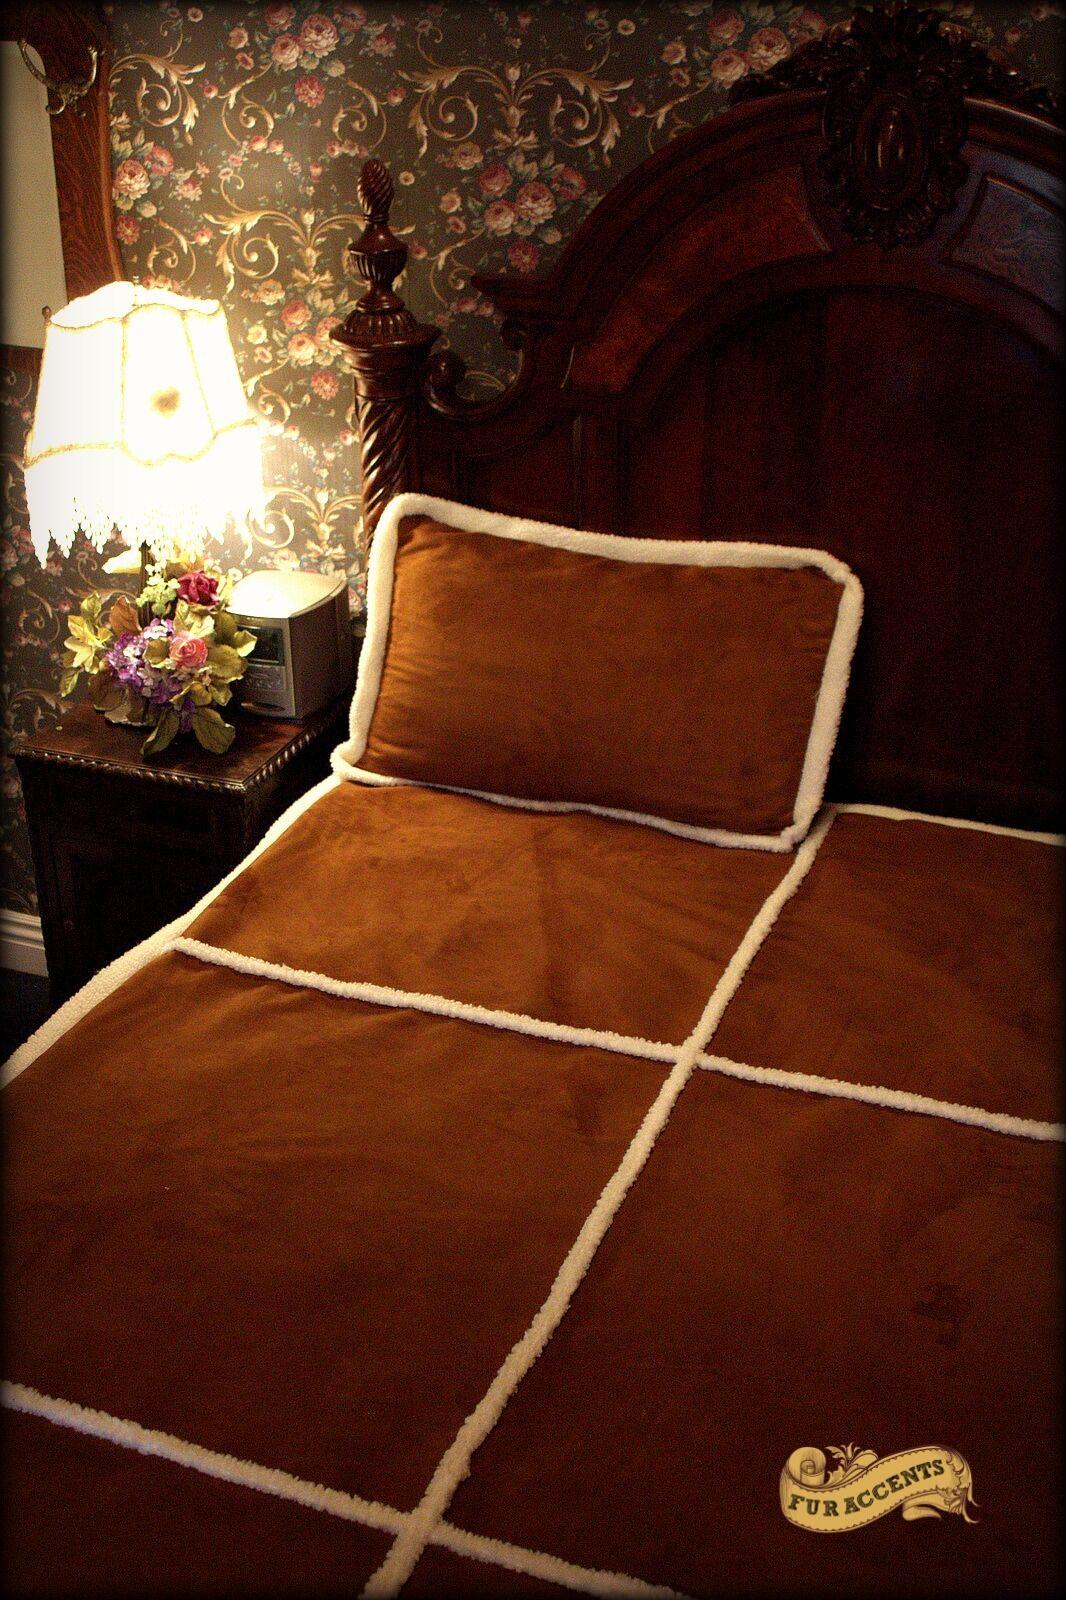 FUR ACCENTS Sheepskin Faux Fur Bedspread Ultra Suede Throw Queen Size 90''x90''